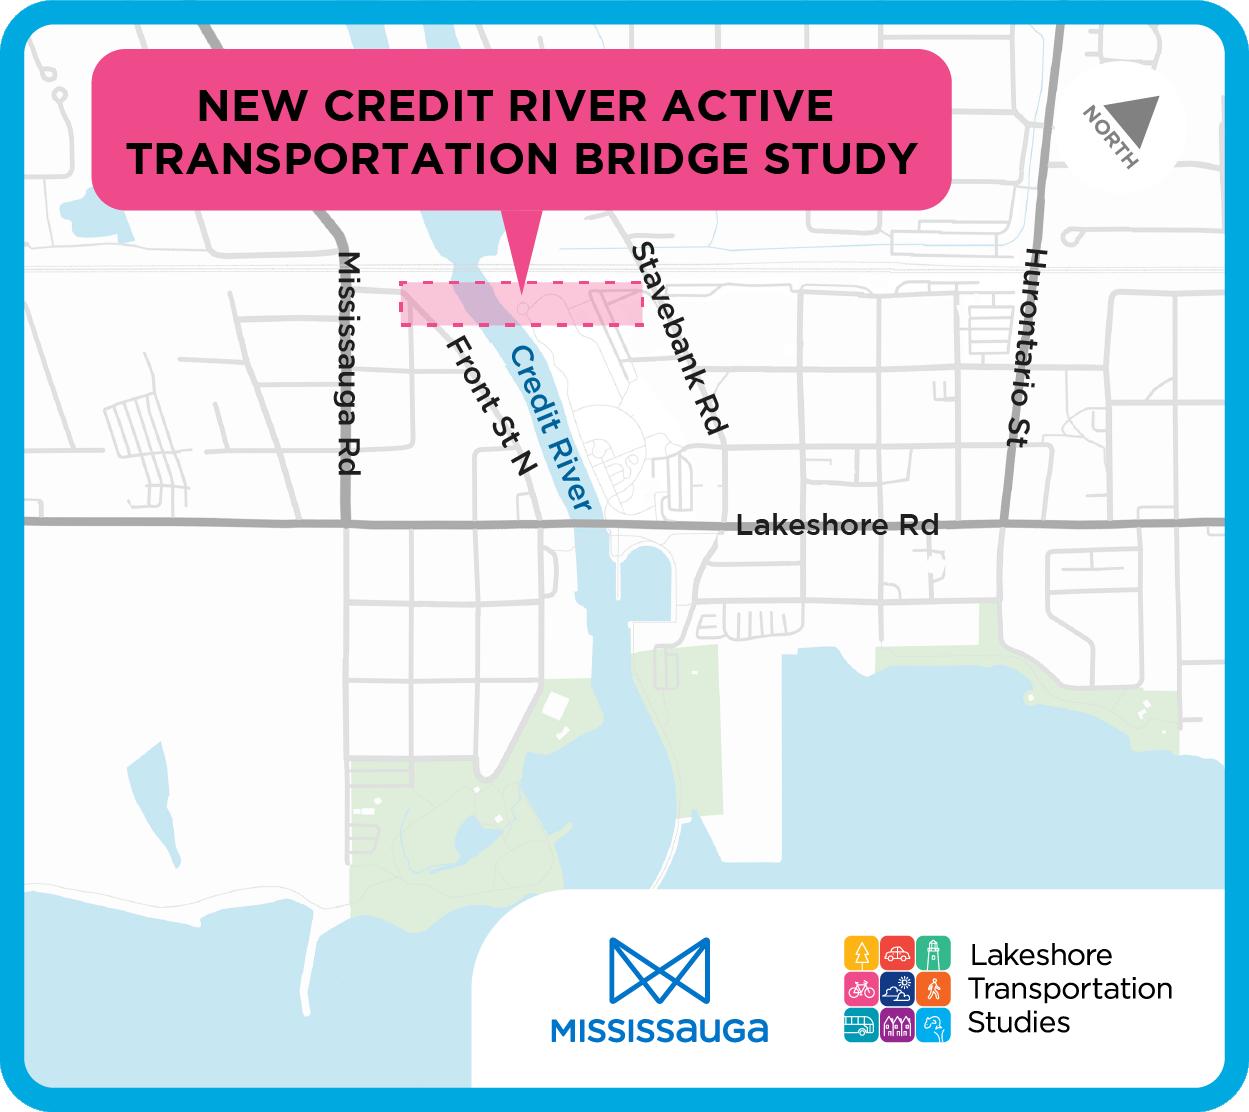 Credit River Active Transportation bridge study area map.